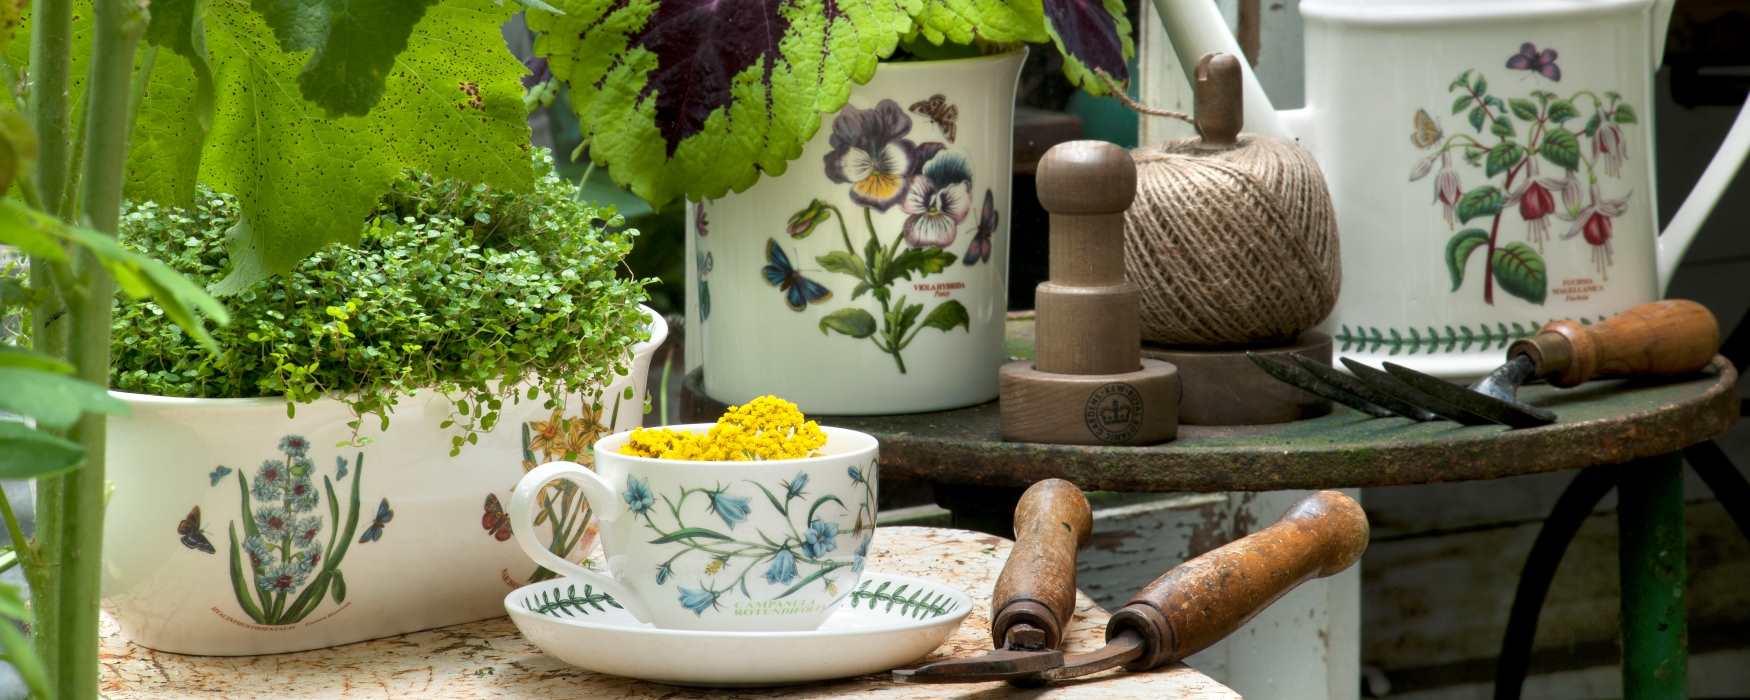 Portmeirion Potteries